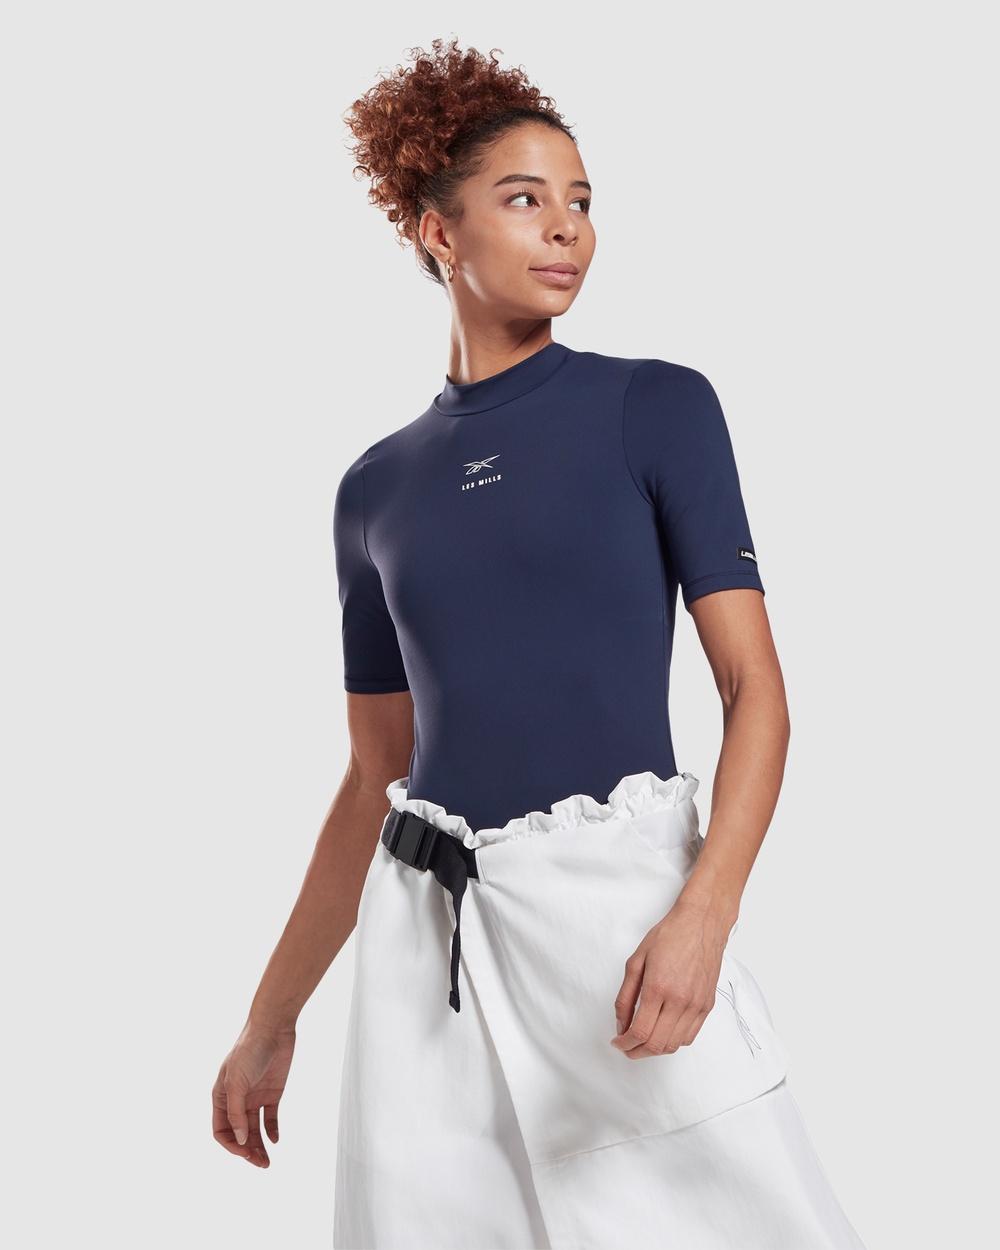 Reebok Performance Les Mills® Short Sleeve Bodysuit Jumpsuits & Playsuits Blue